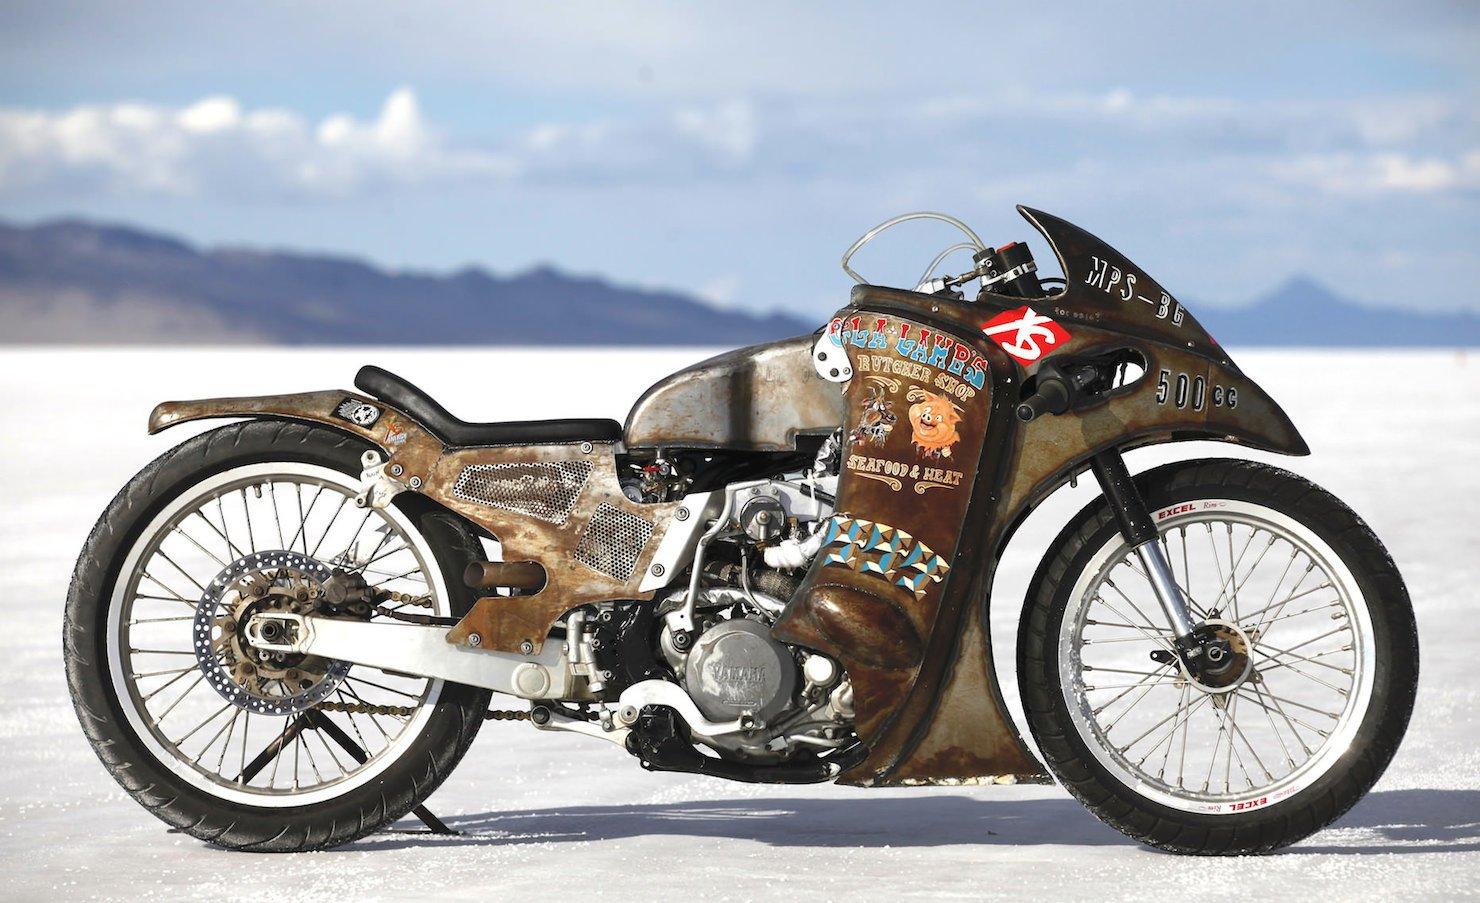 Turbo Yamaha Salt Flat Racer by Super Rat